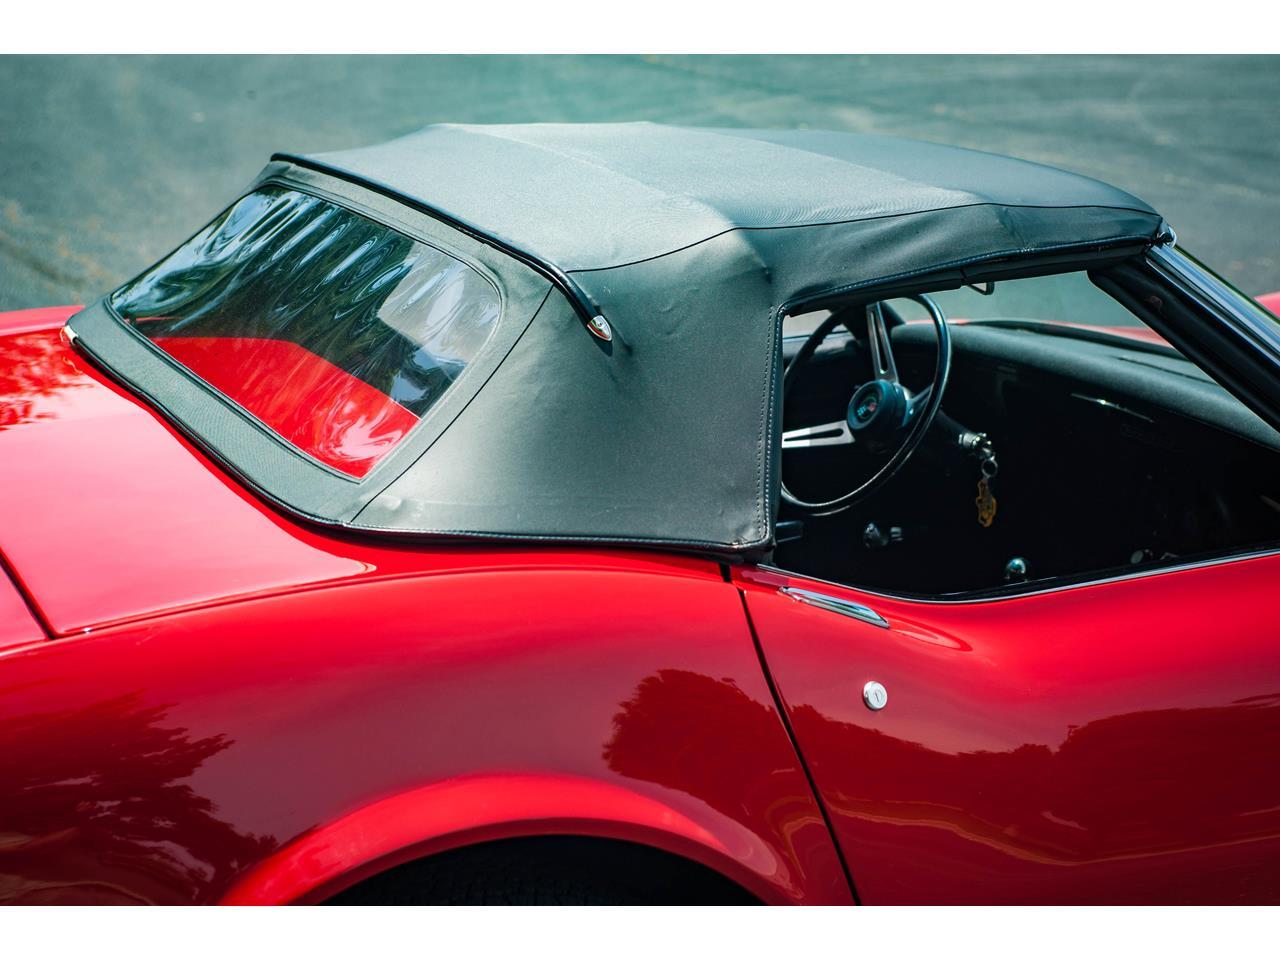 Large Picture of 1971 Chevrolet Corvette located in Illinois - QB9M